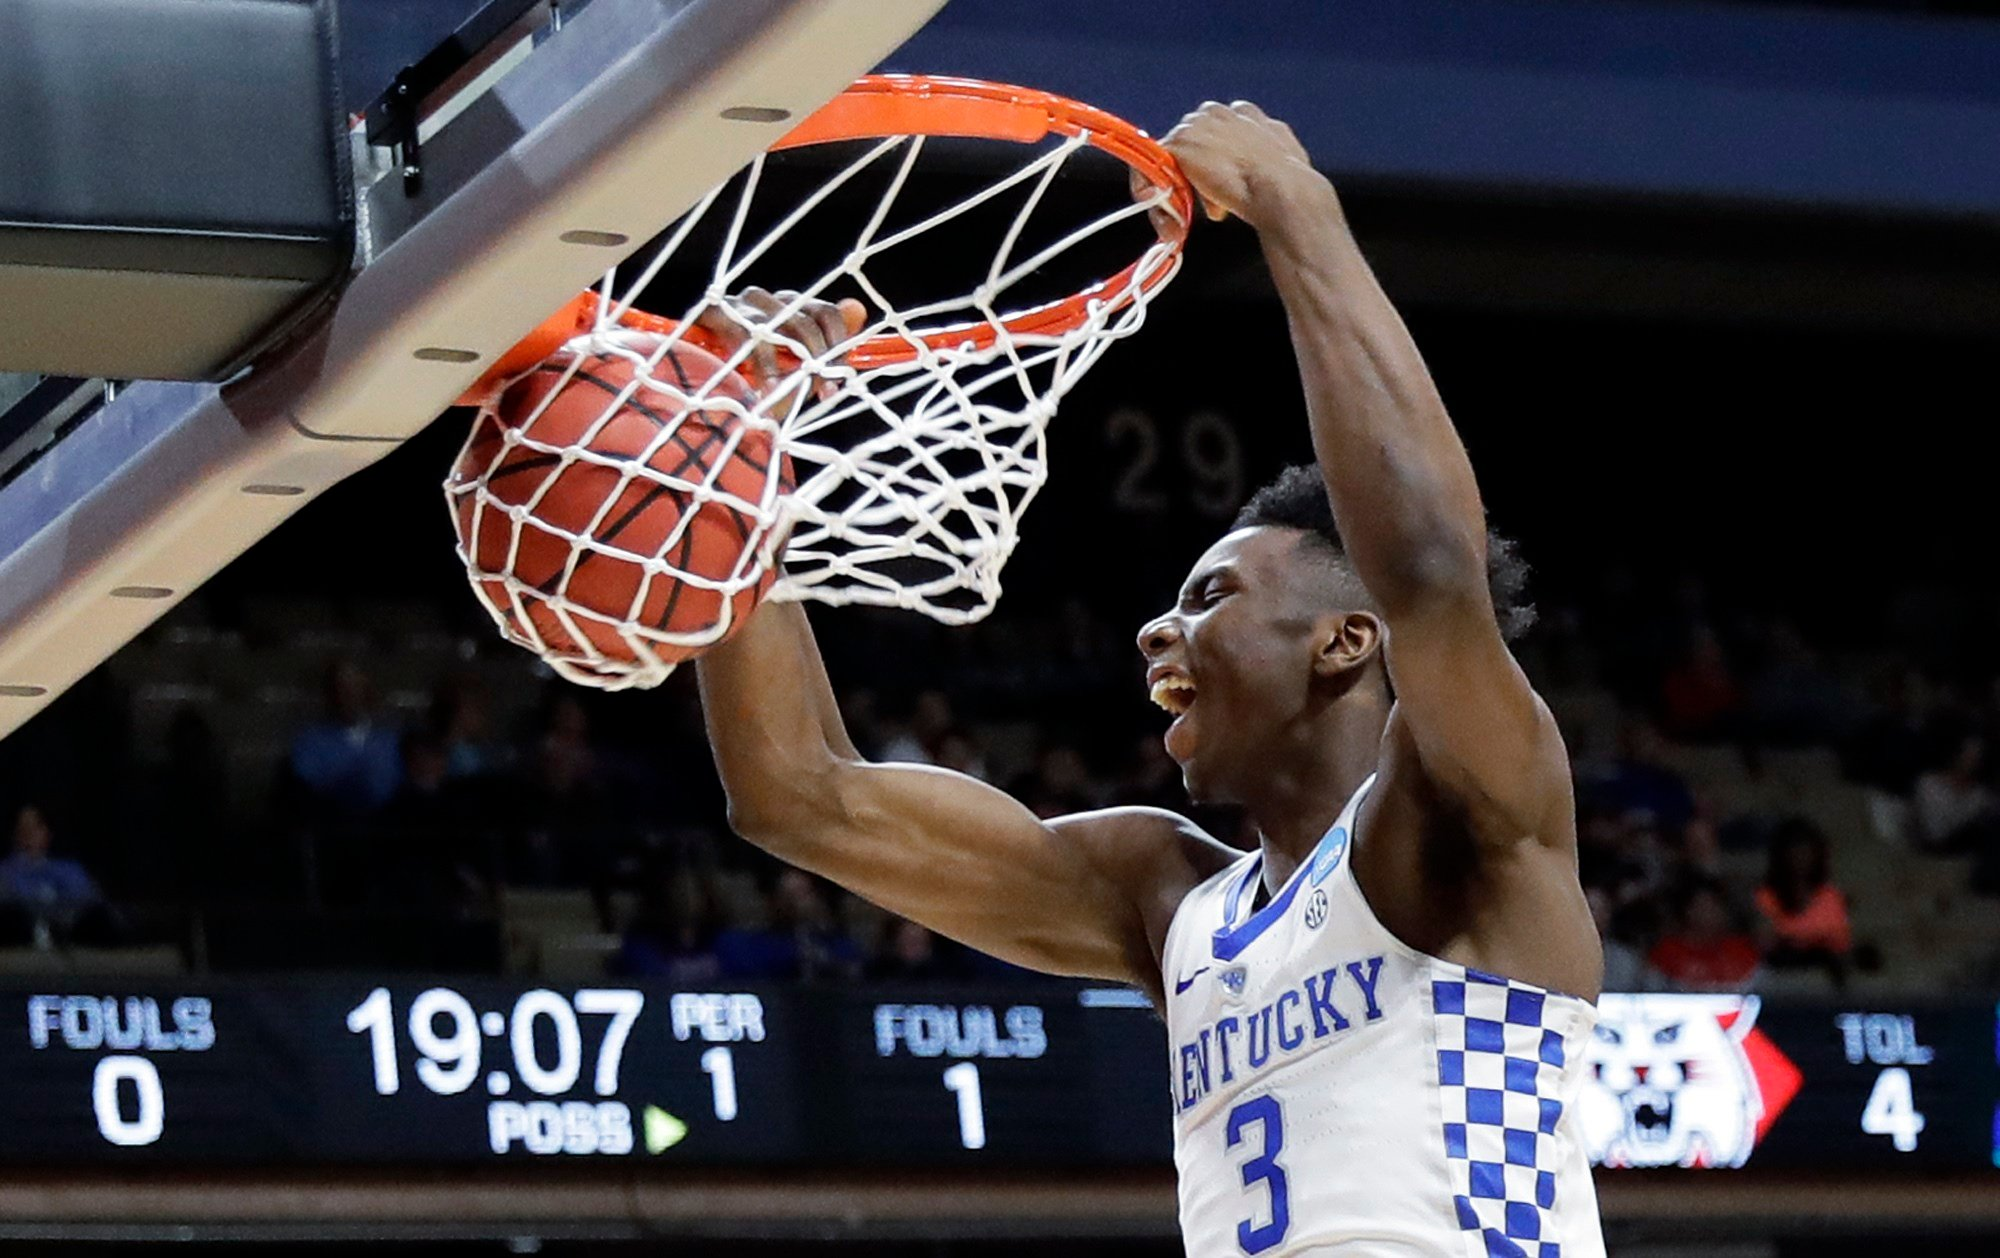 Kentucky tops Davidson despite end to 1047-game 3-pointer streak